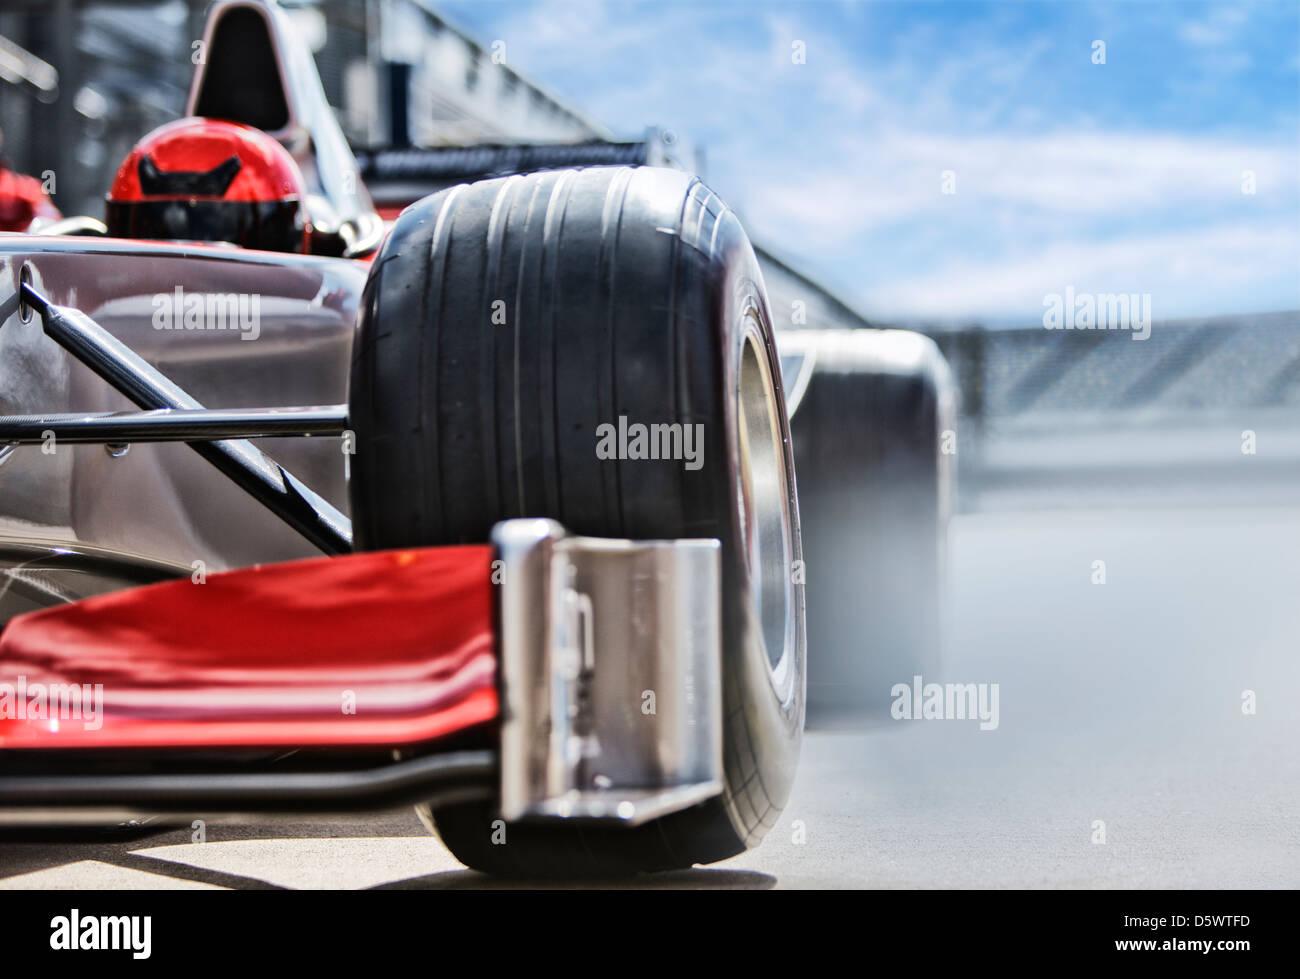 Race car sitting on track - Stock Image